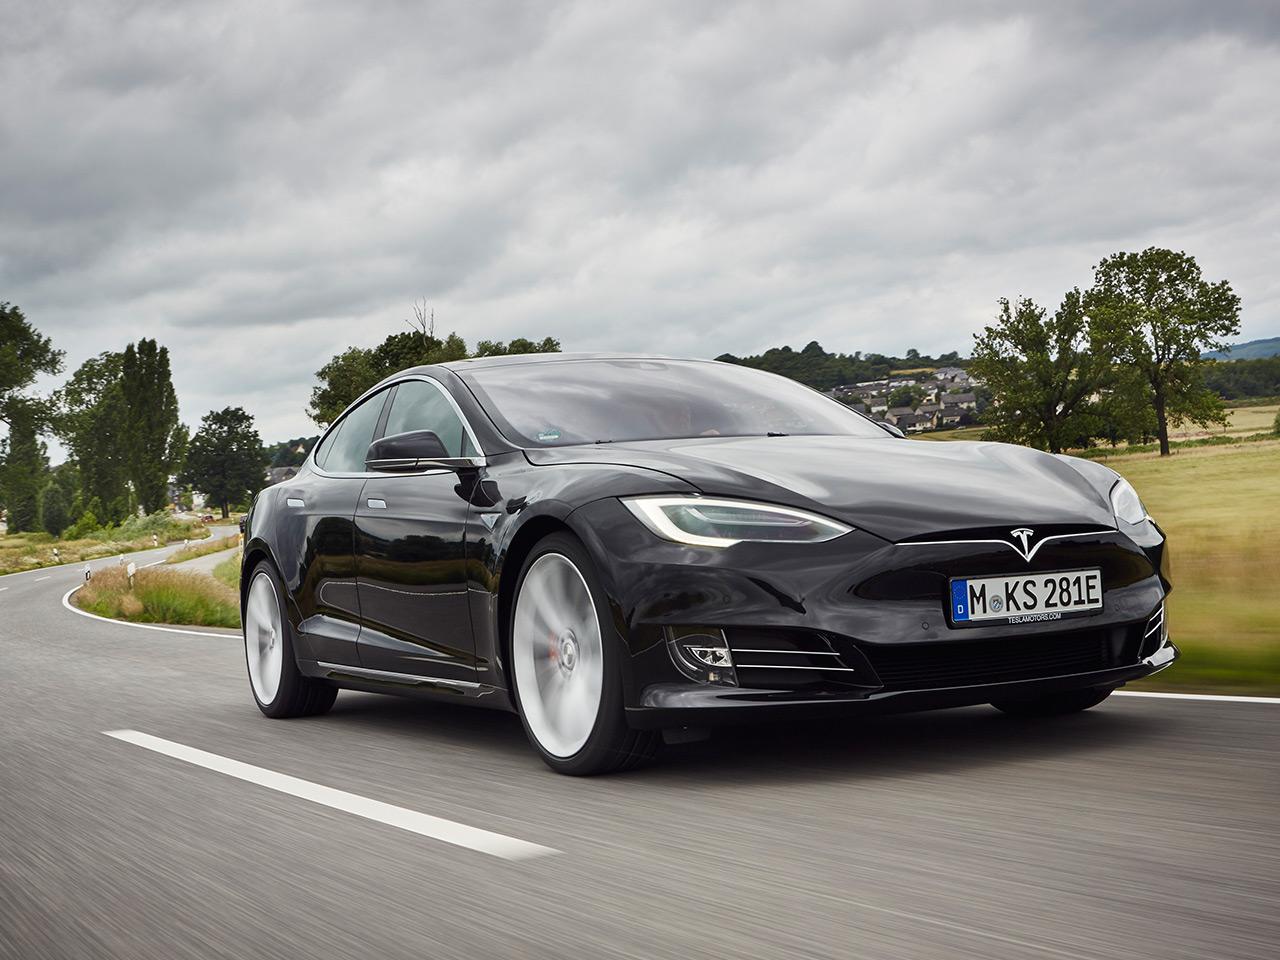 Tesla-Unfall mit Autopilot: Fahrer ignoriert Warnungen  